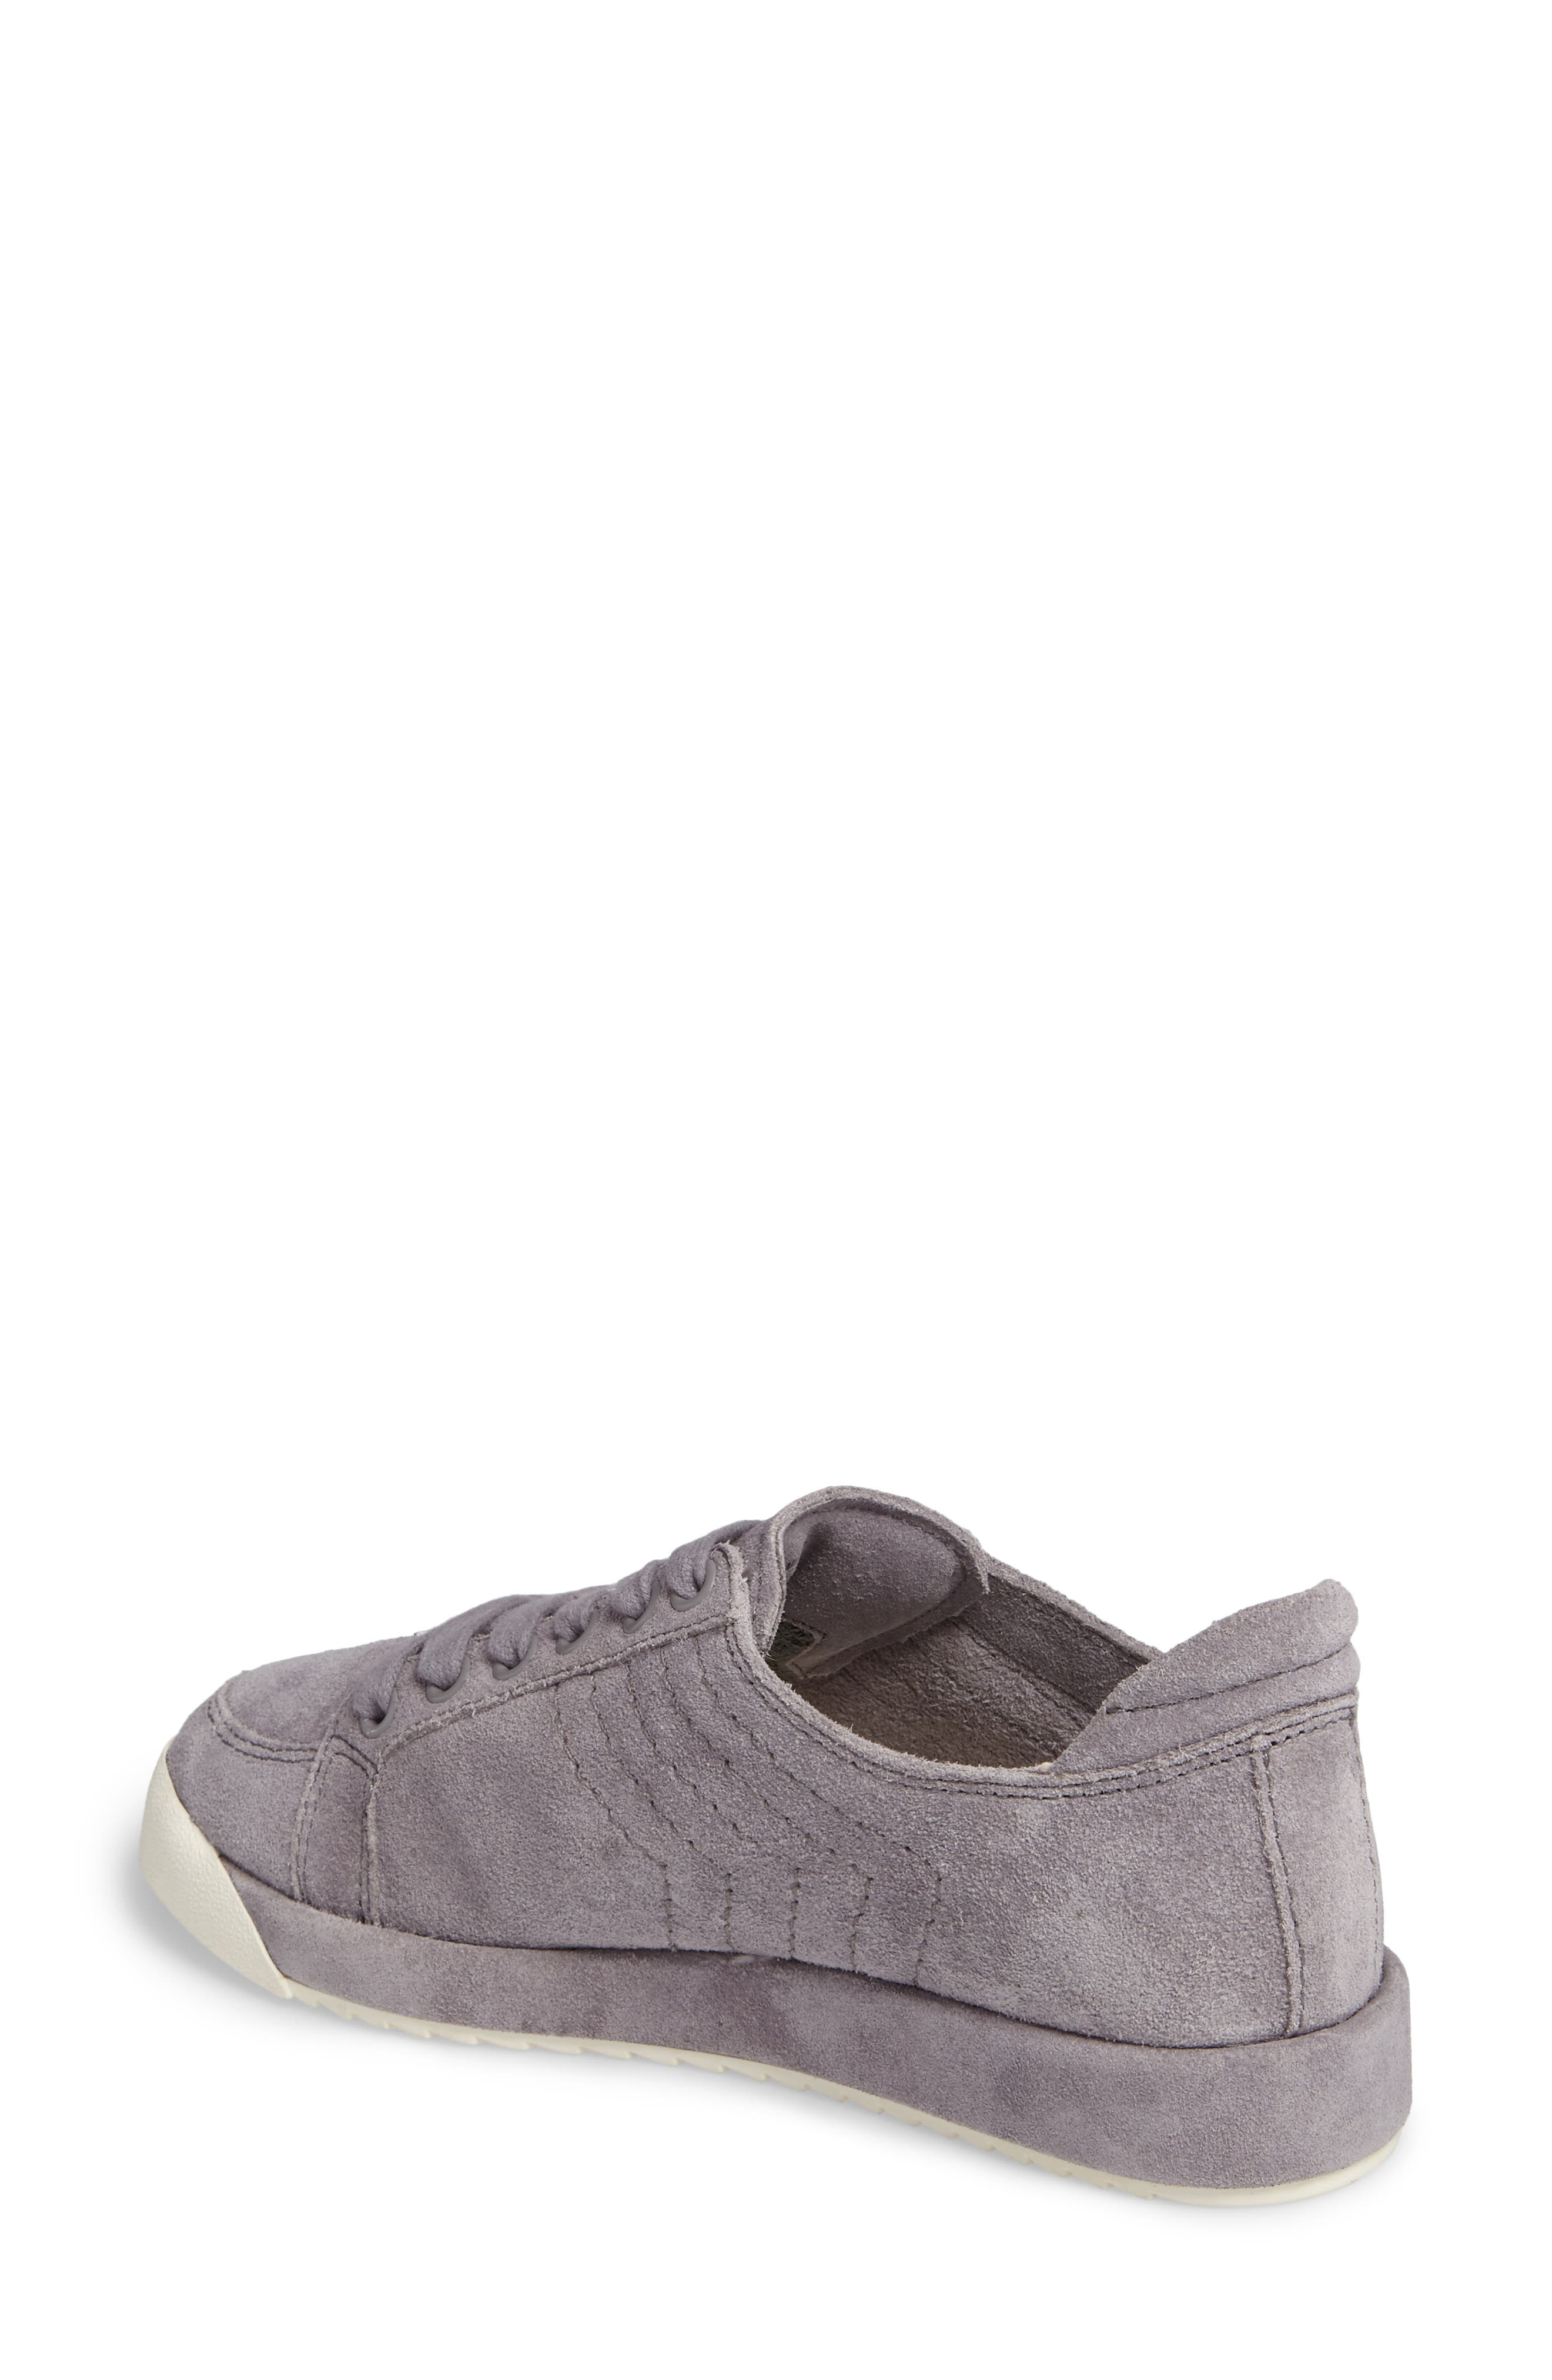 Sage Low-Top Sneaker,                             Alternate thumbnail 3, color,